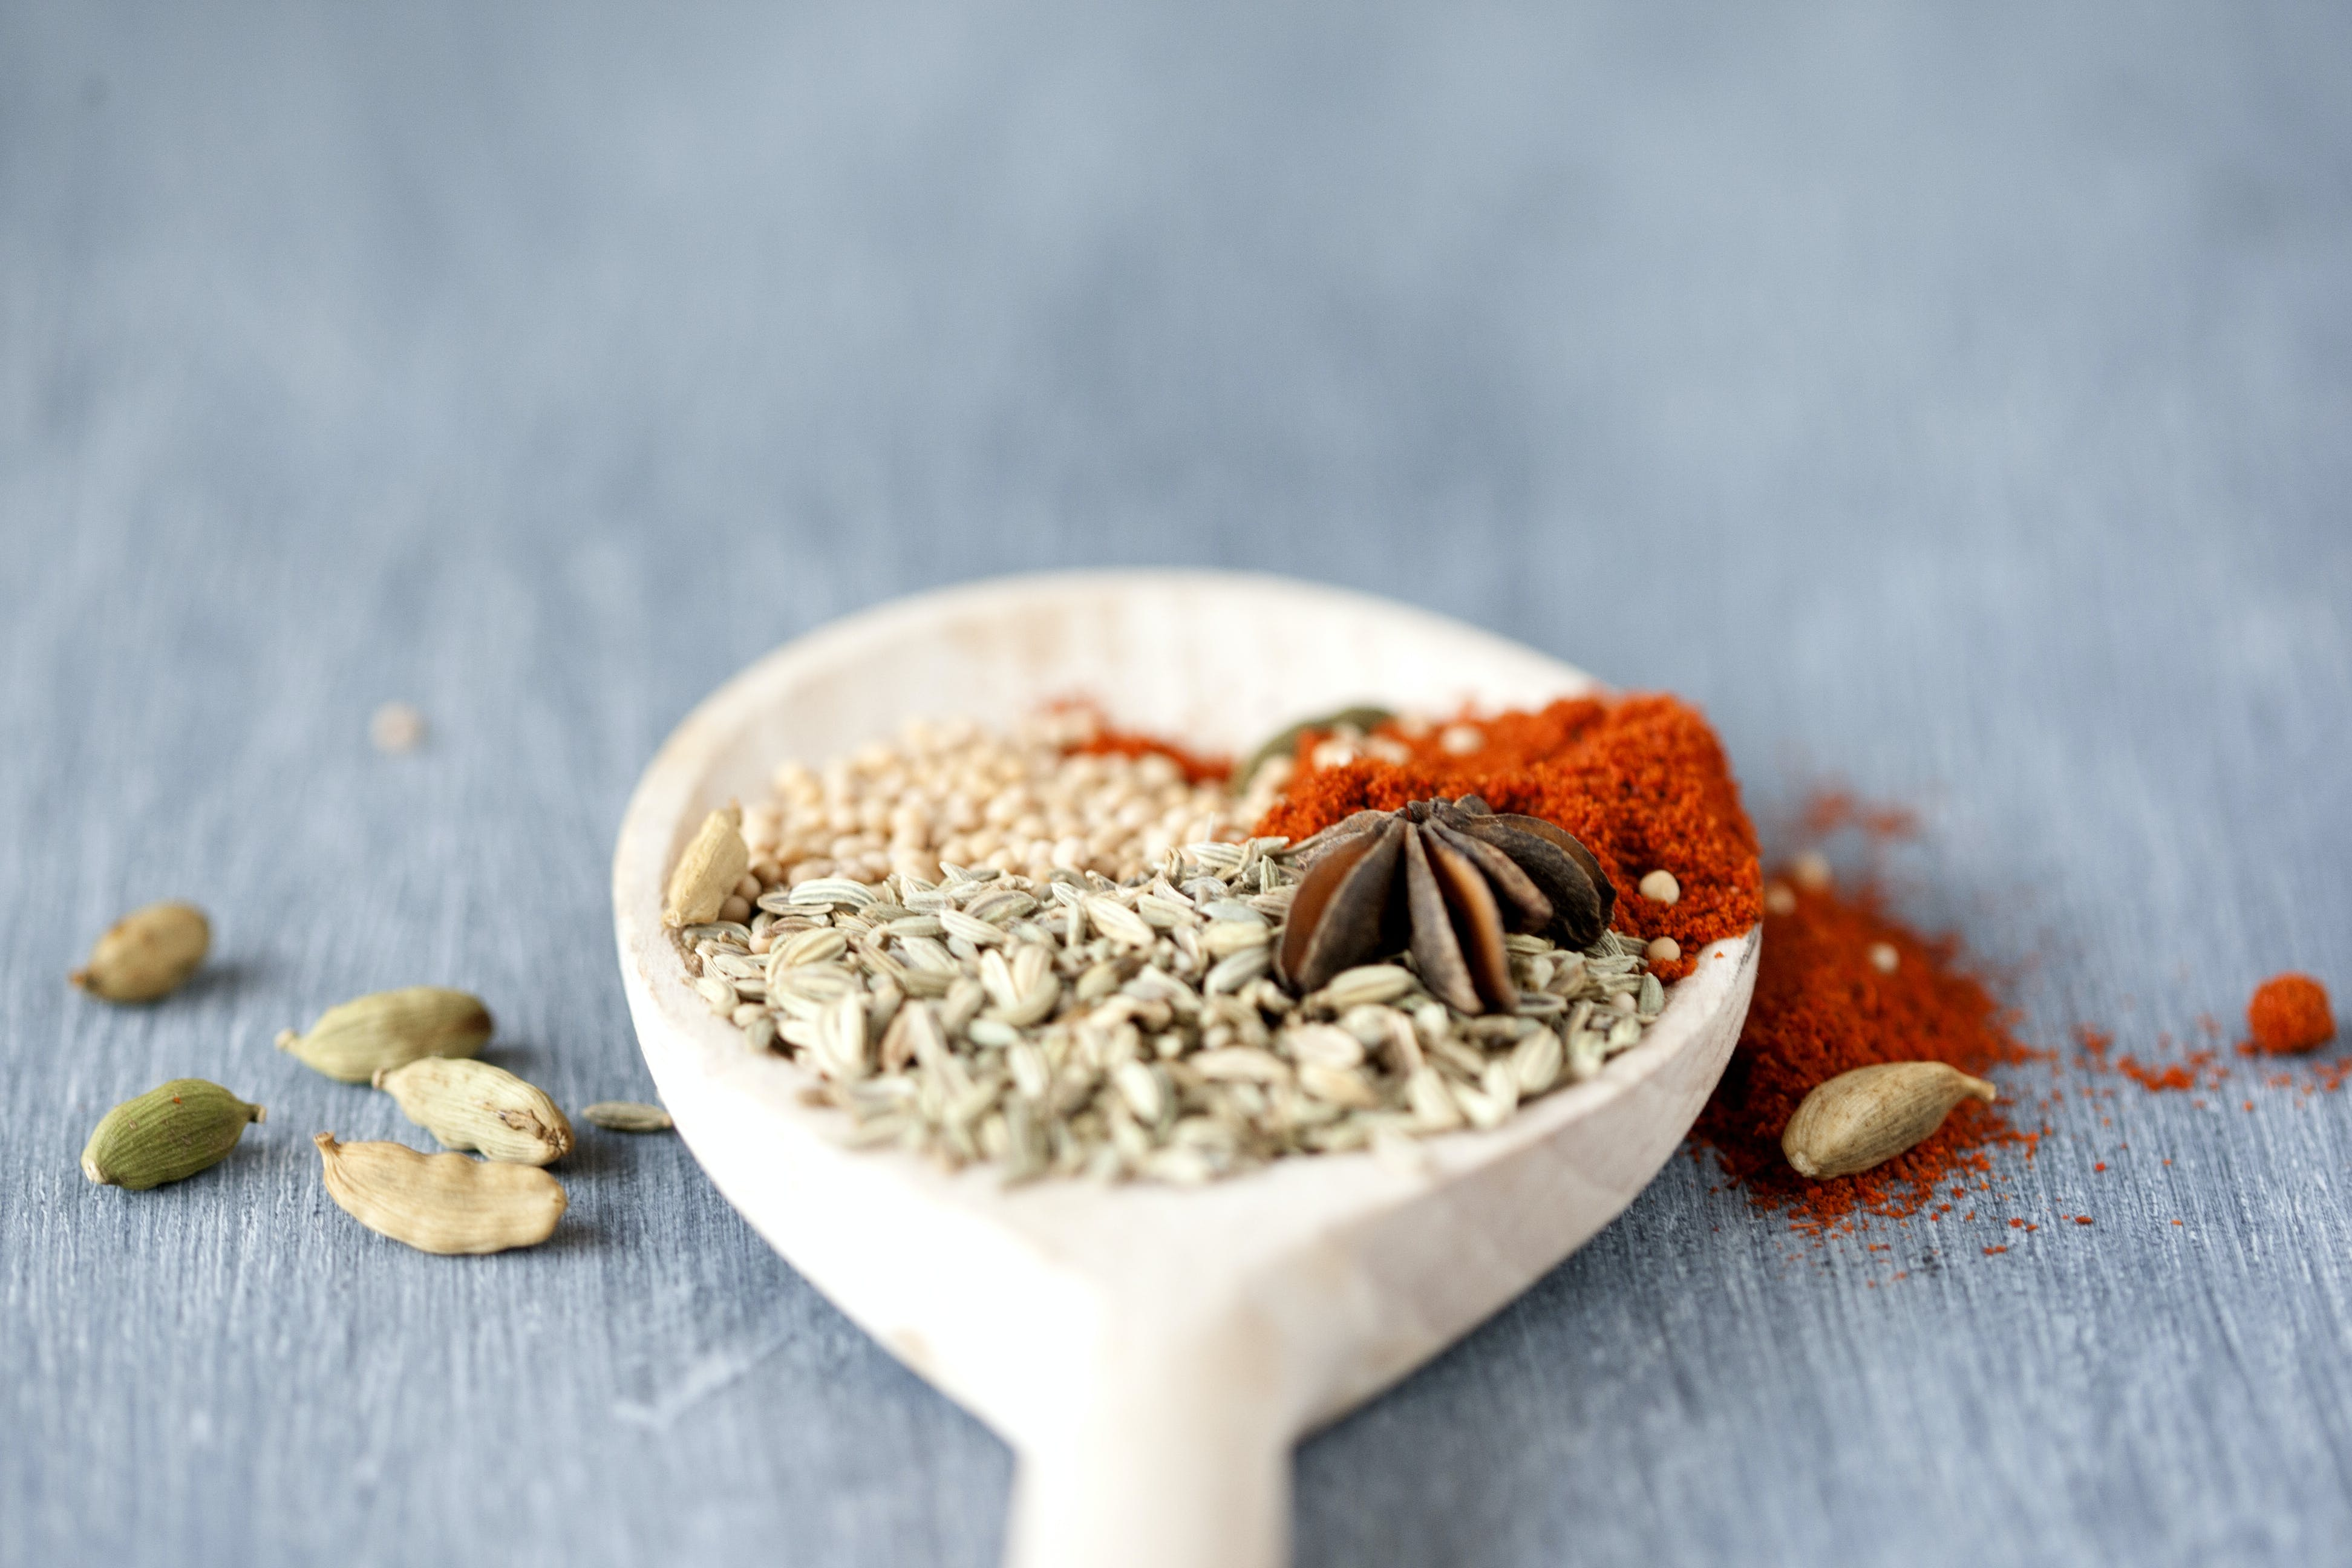 Assorted Seasoning in White Ceramic Spoon